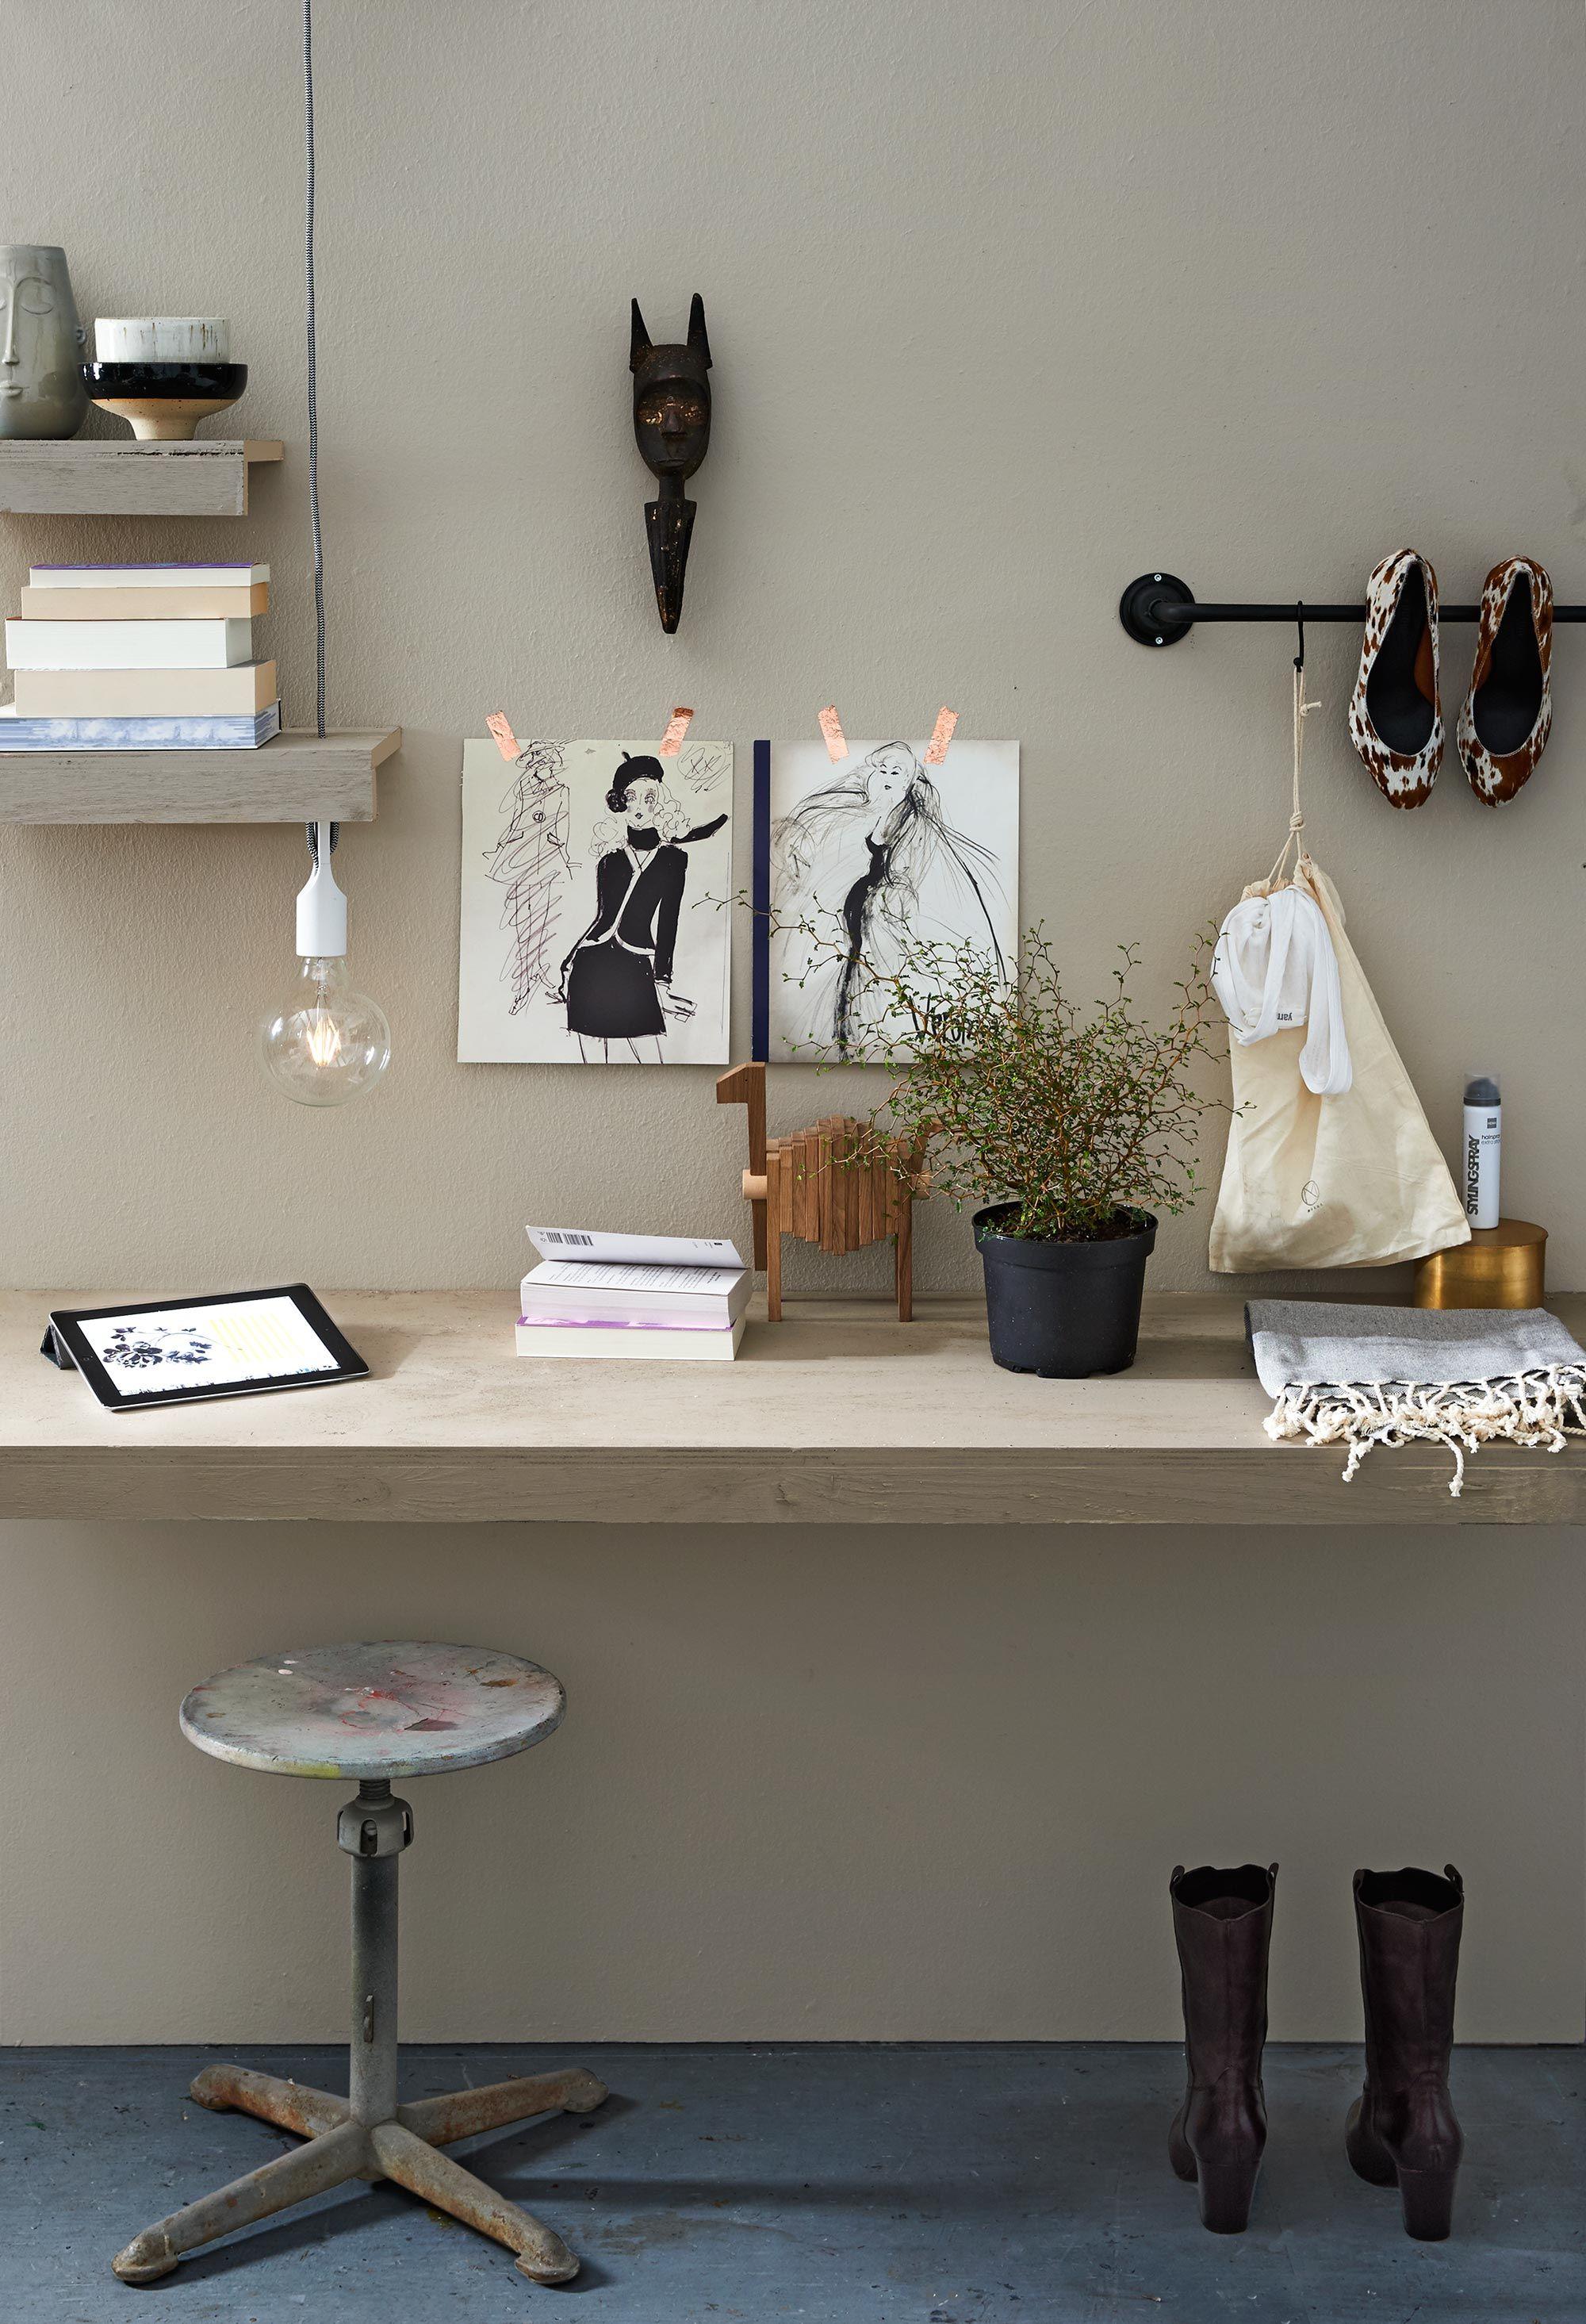 slaapkamer styling werkplek flax   For the Home   Pinterest ...